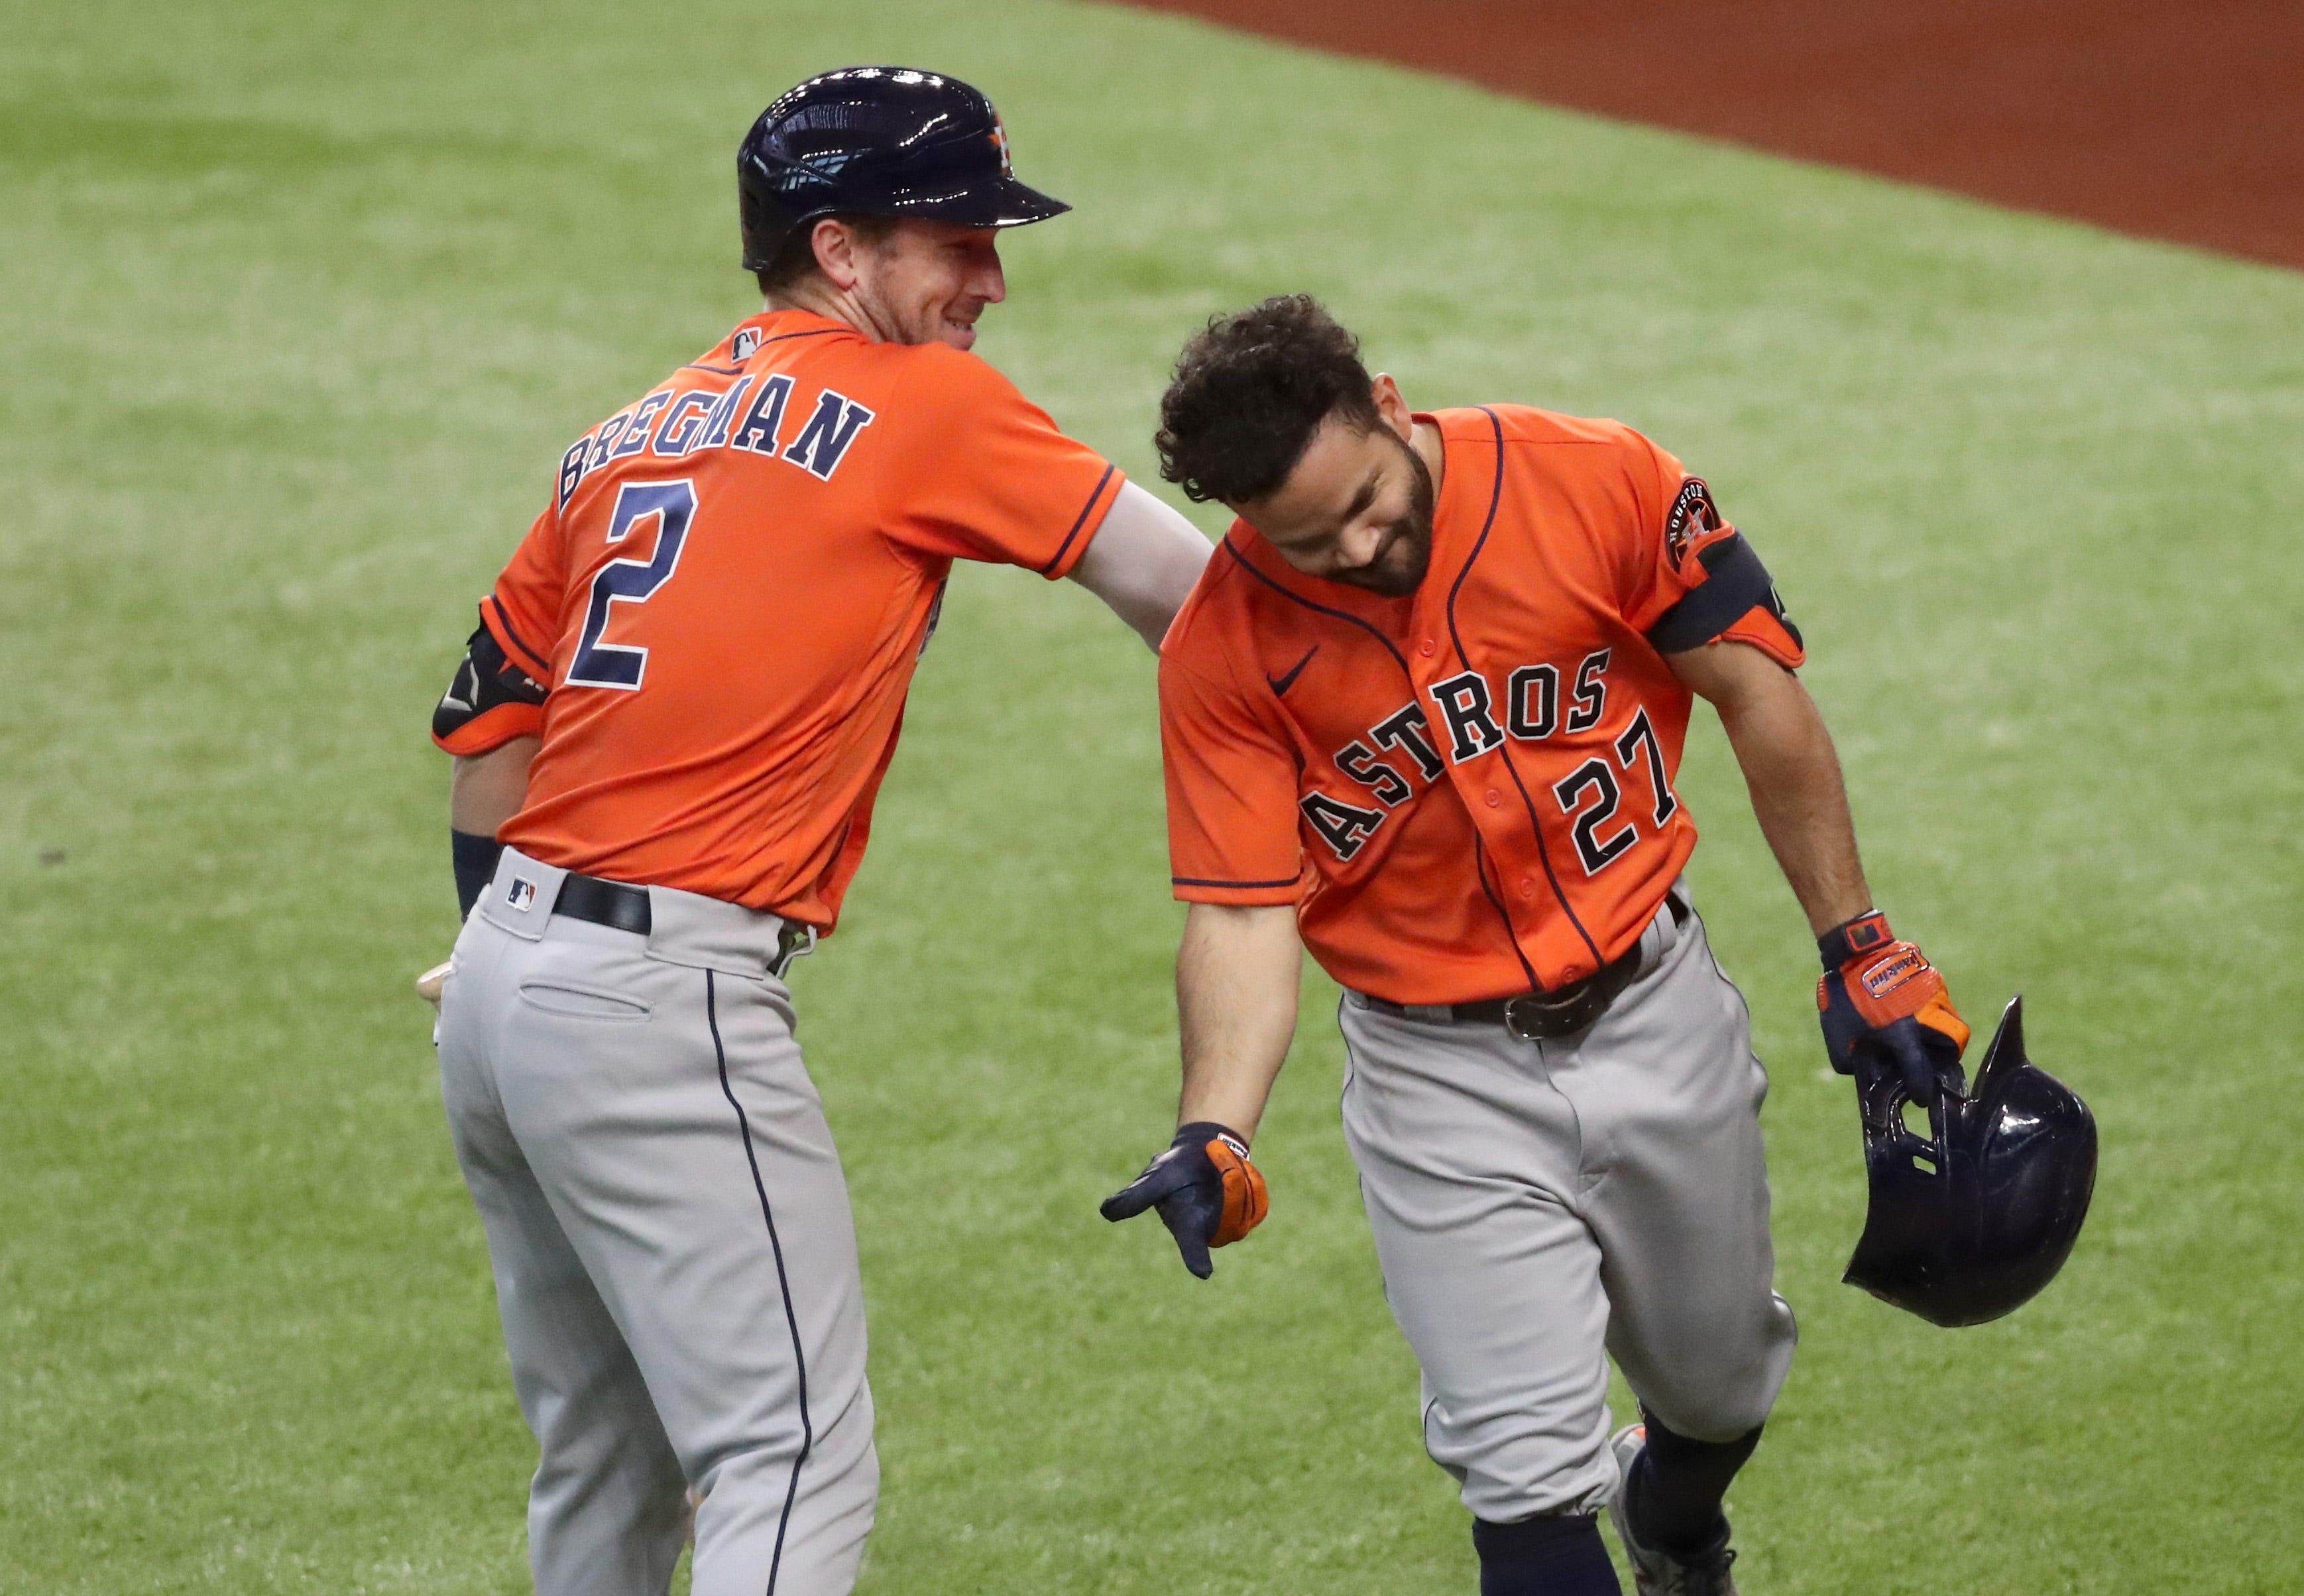 MLB playoffs live updates: Astros hand Twins their 17th consecutive postseason loss